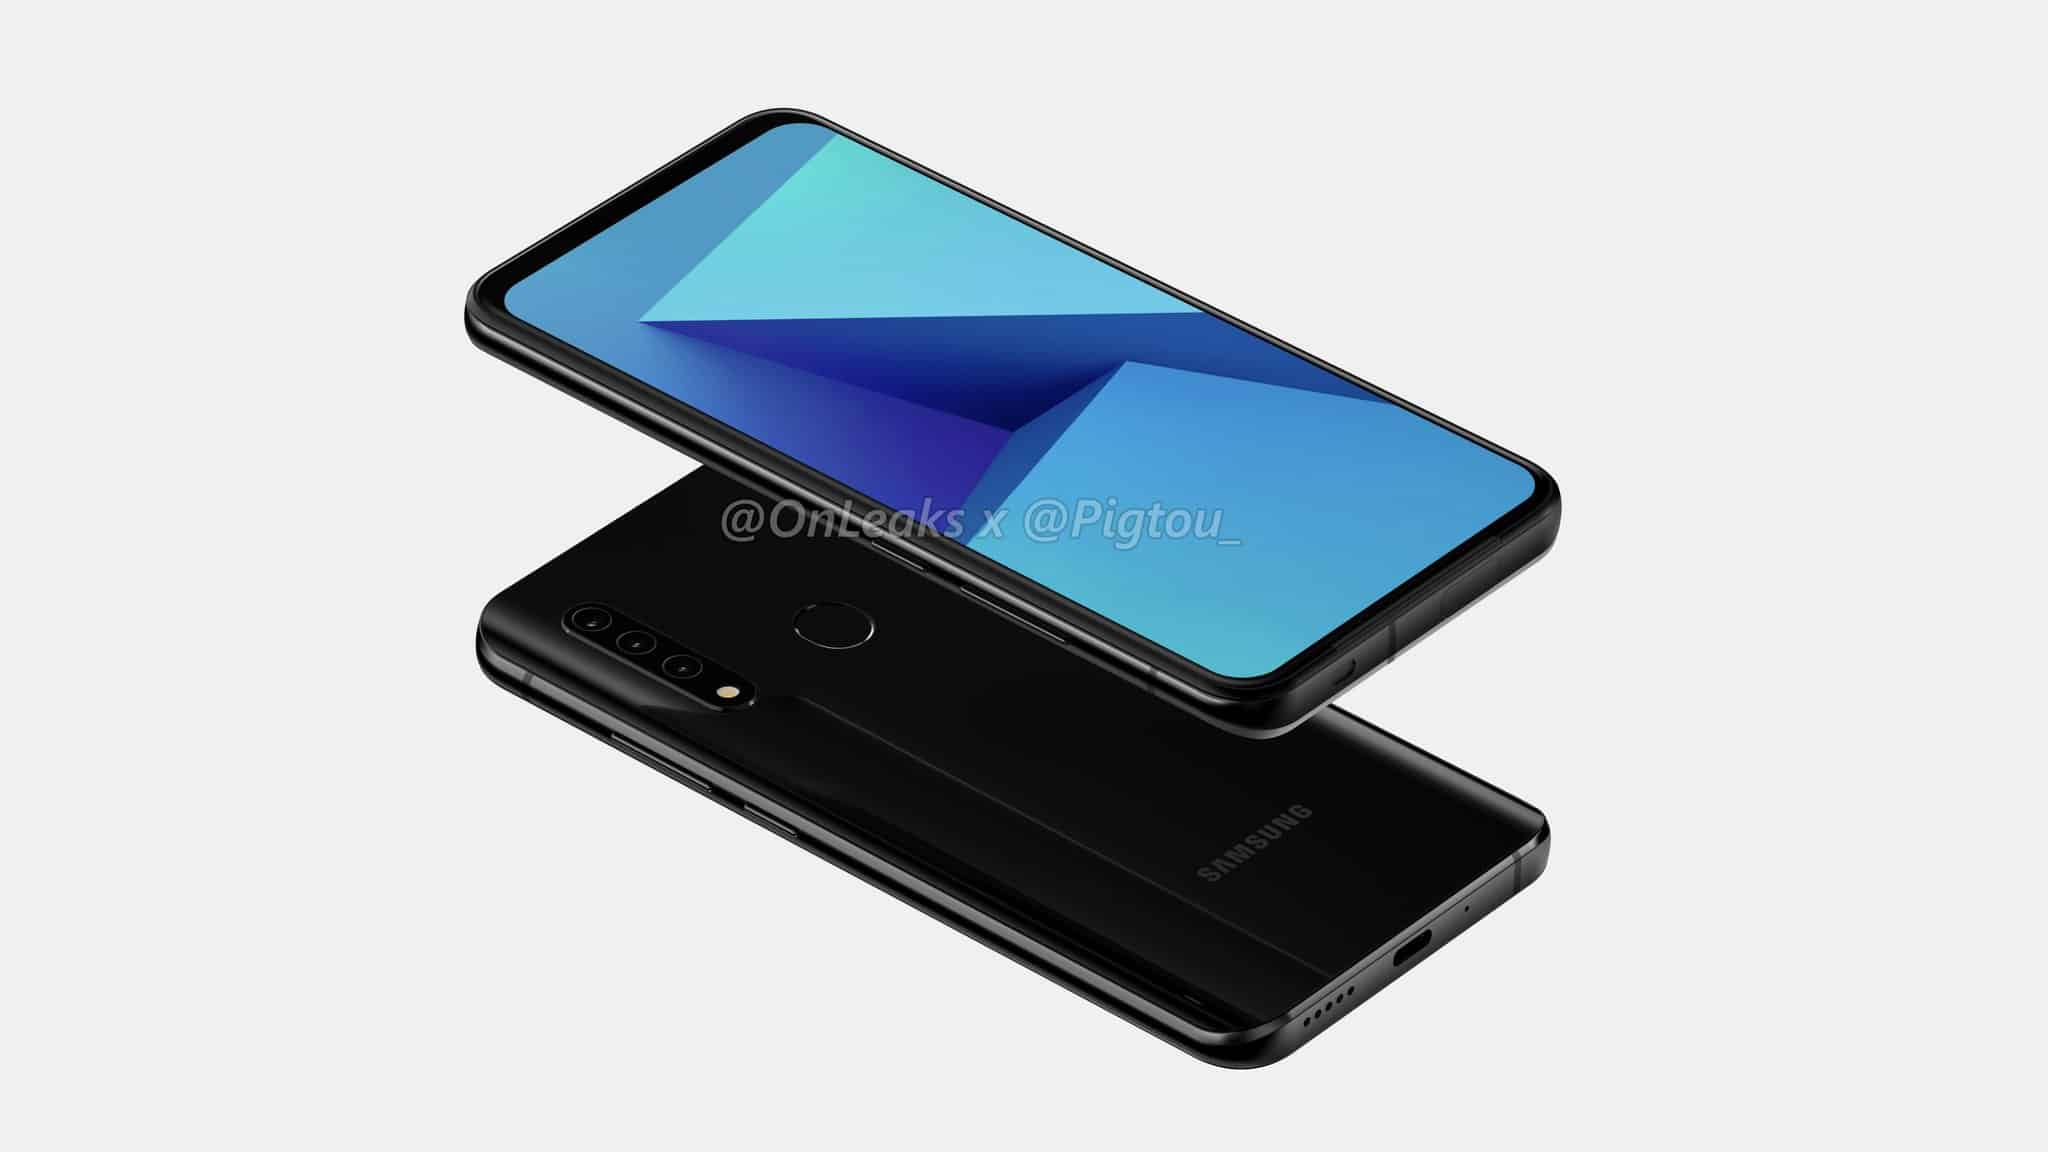 Samsung first smartphone pop up camera leak 3